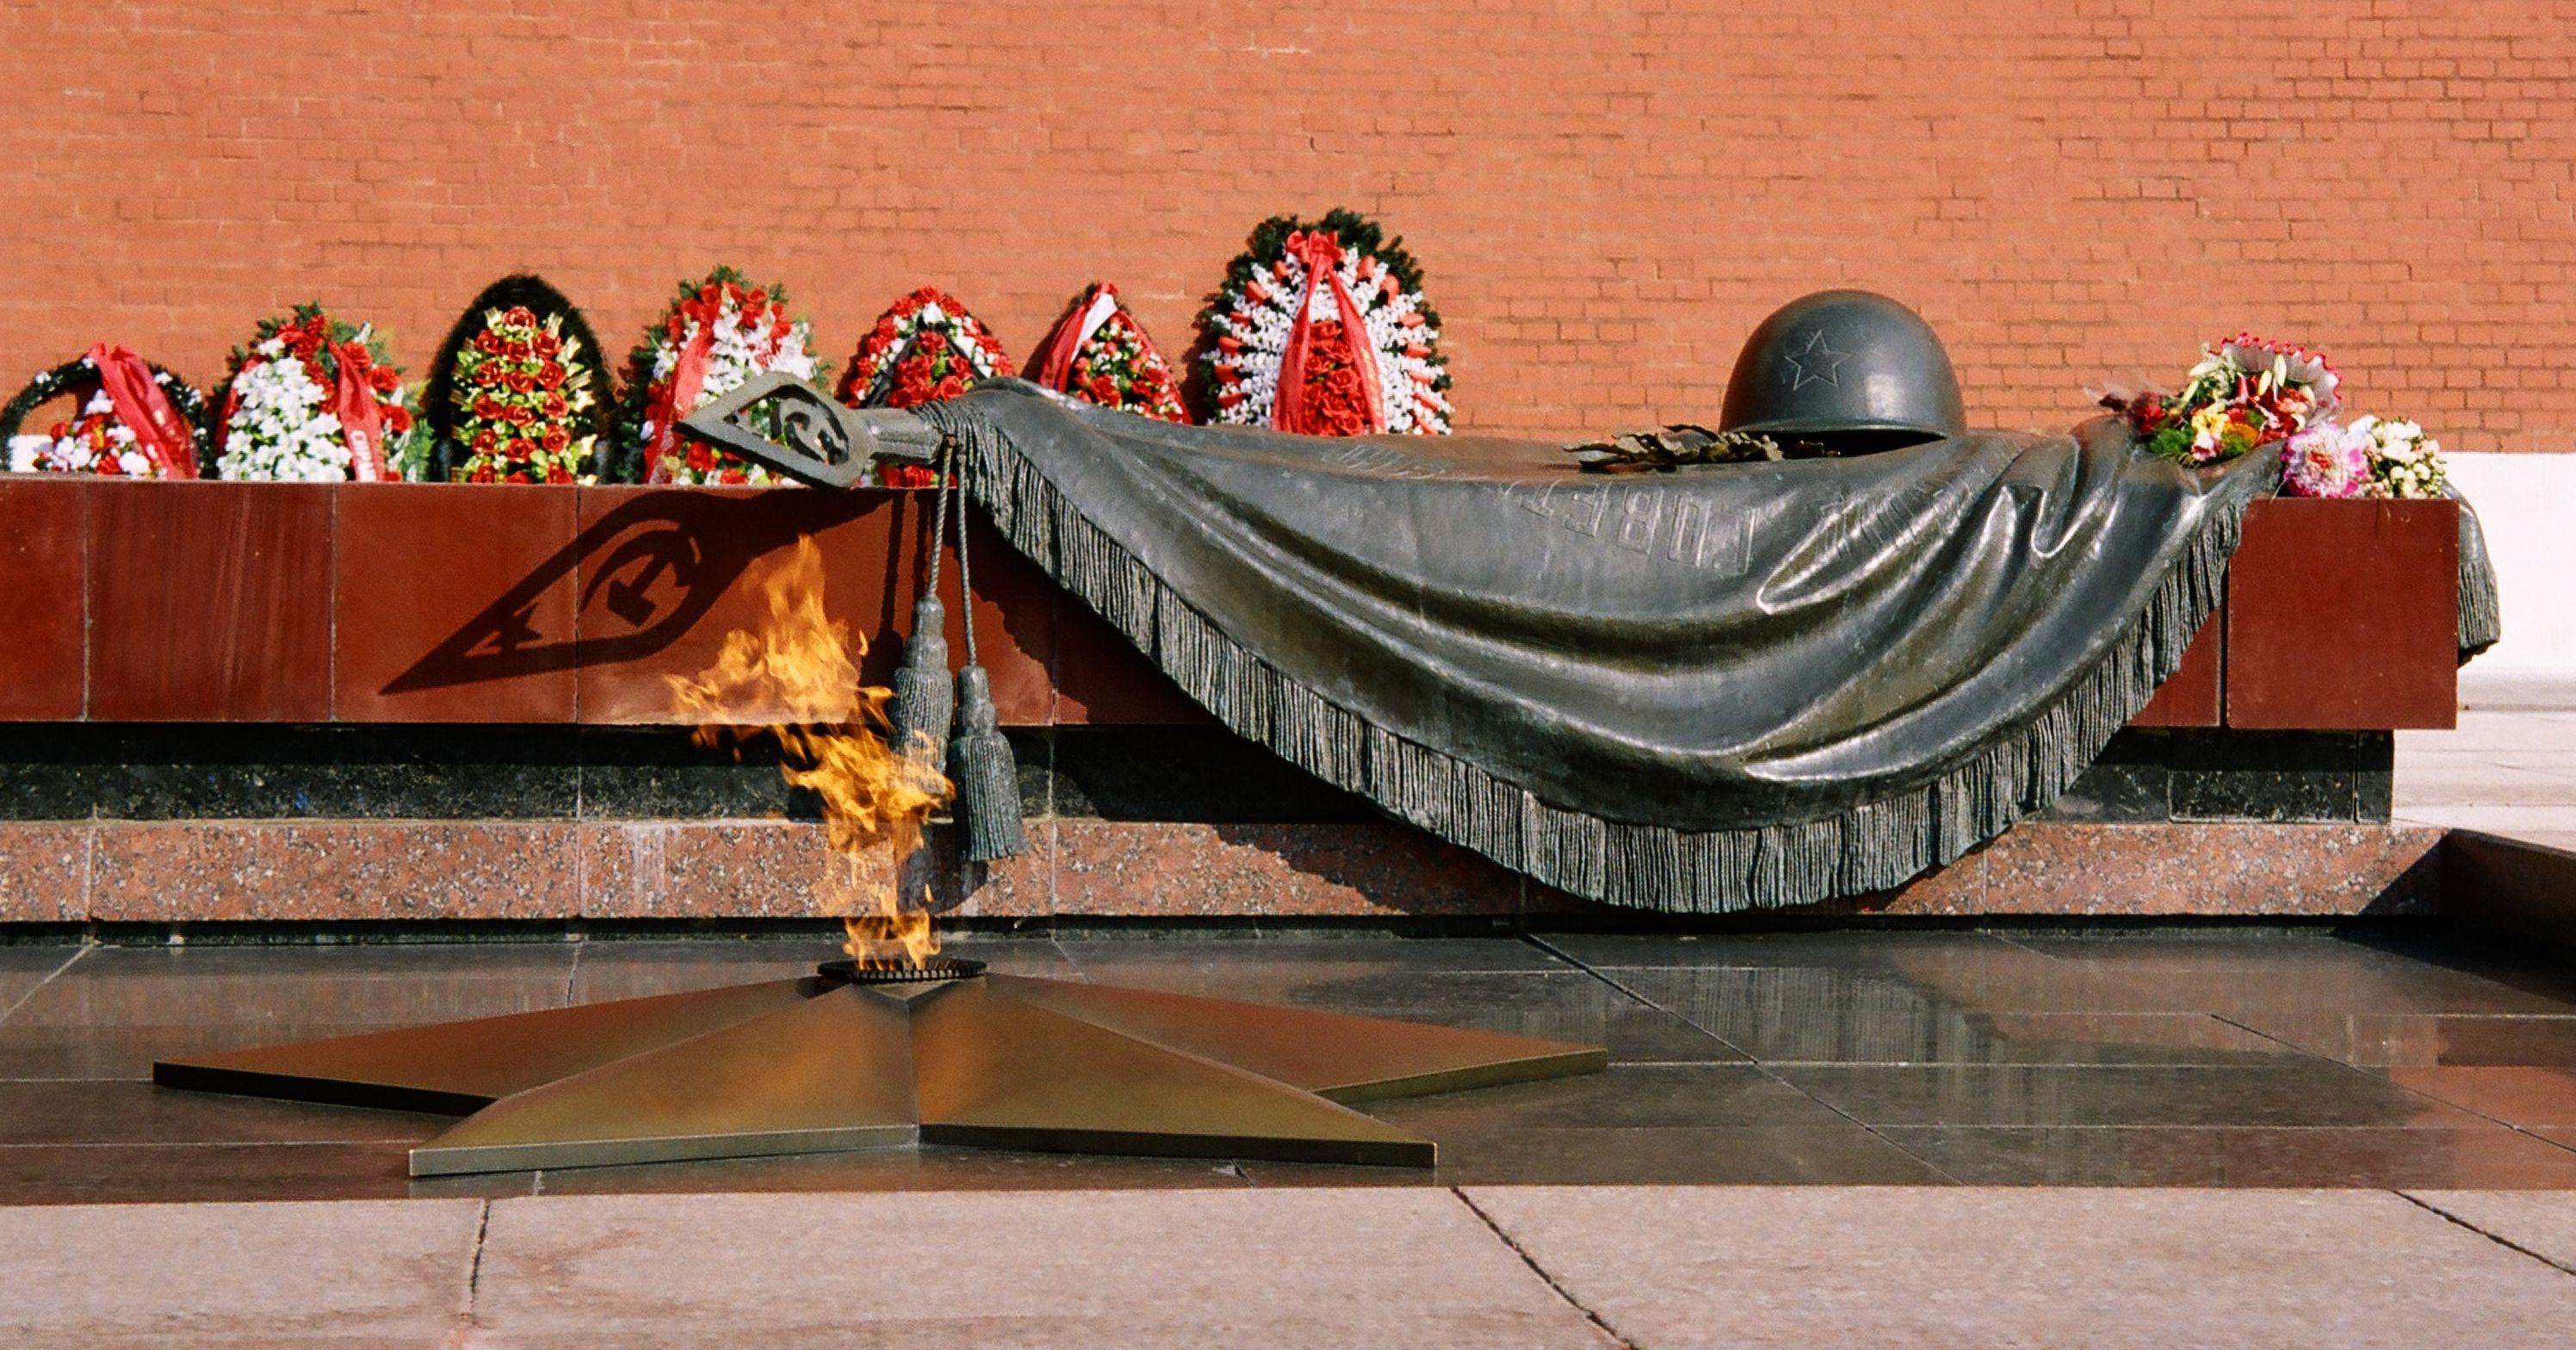 Tomb_of_the_Unknown_Soldier_Alexander_Garden1